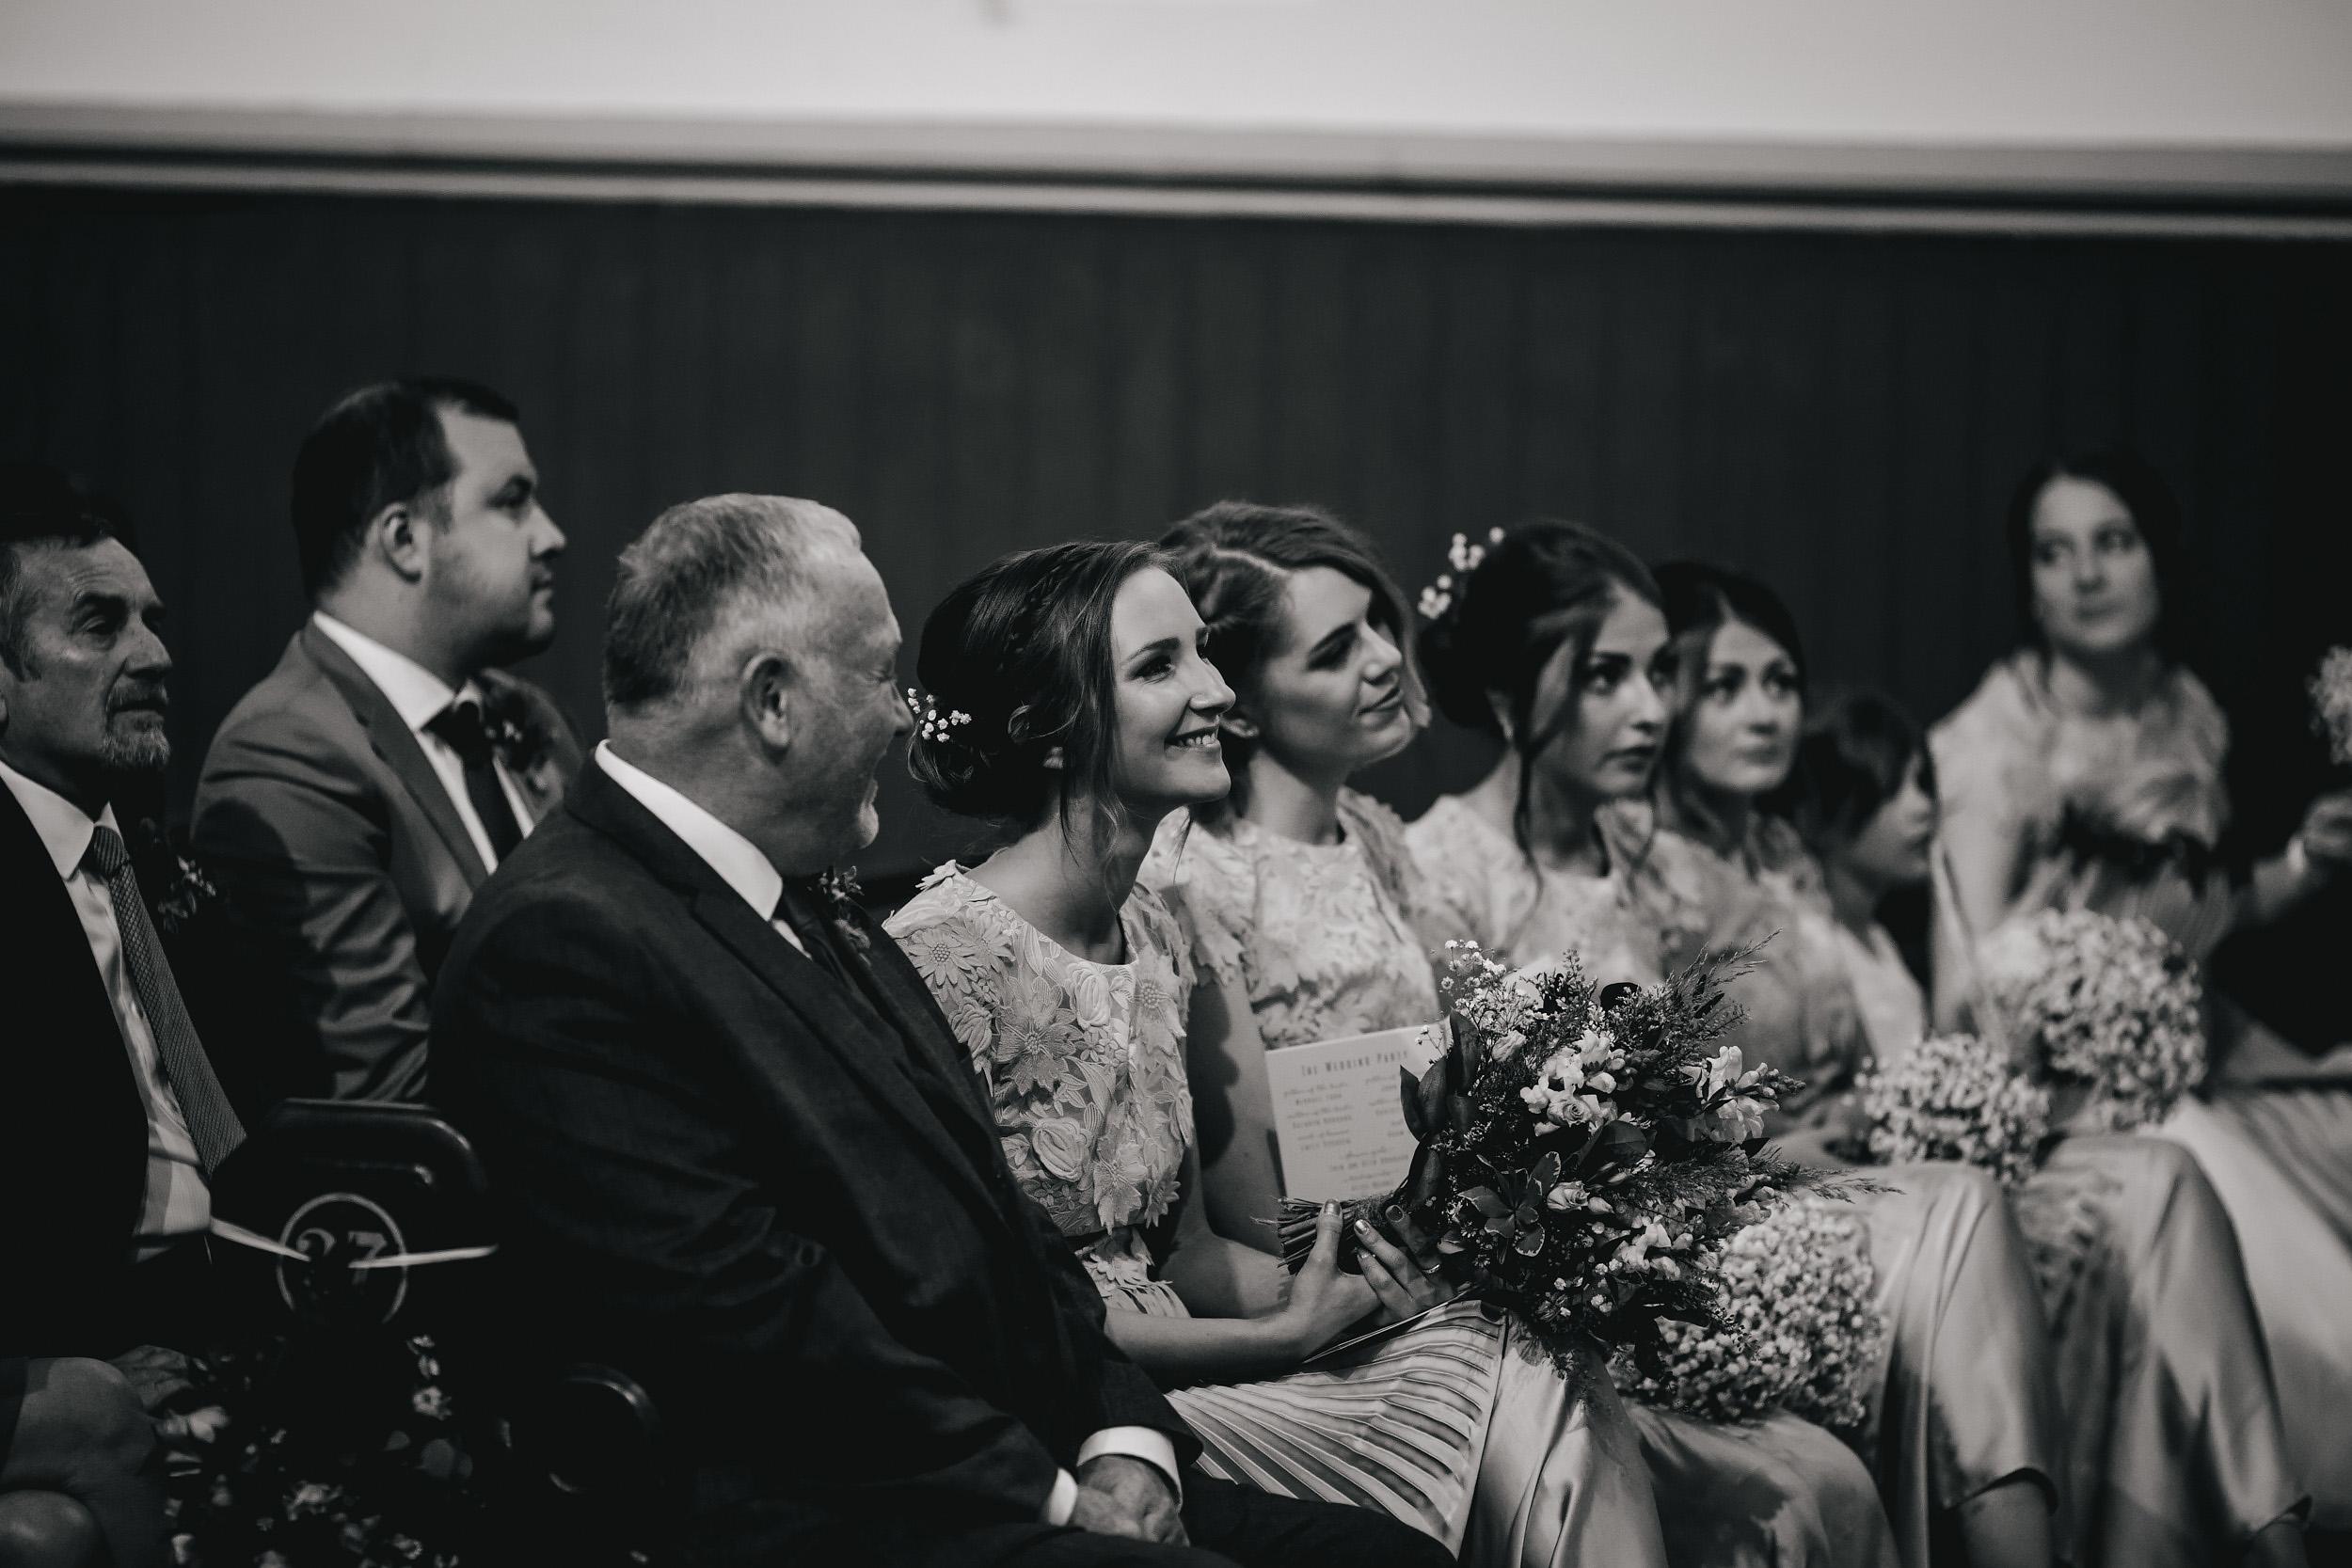 Bridesmaids at a church wedding in Leeds